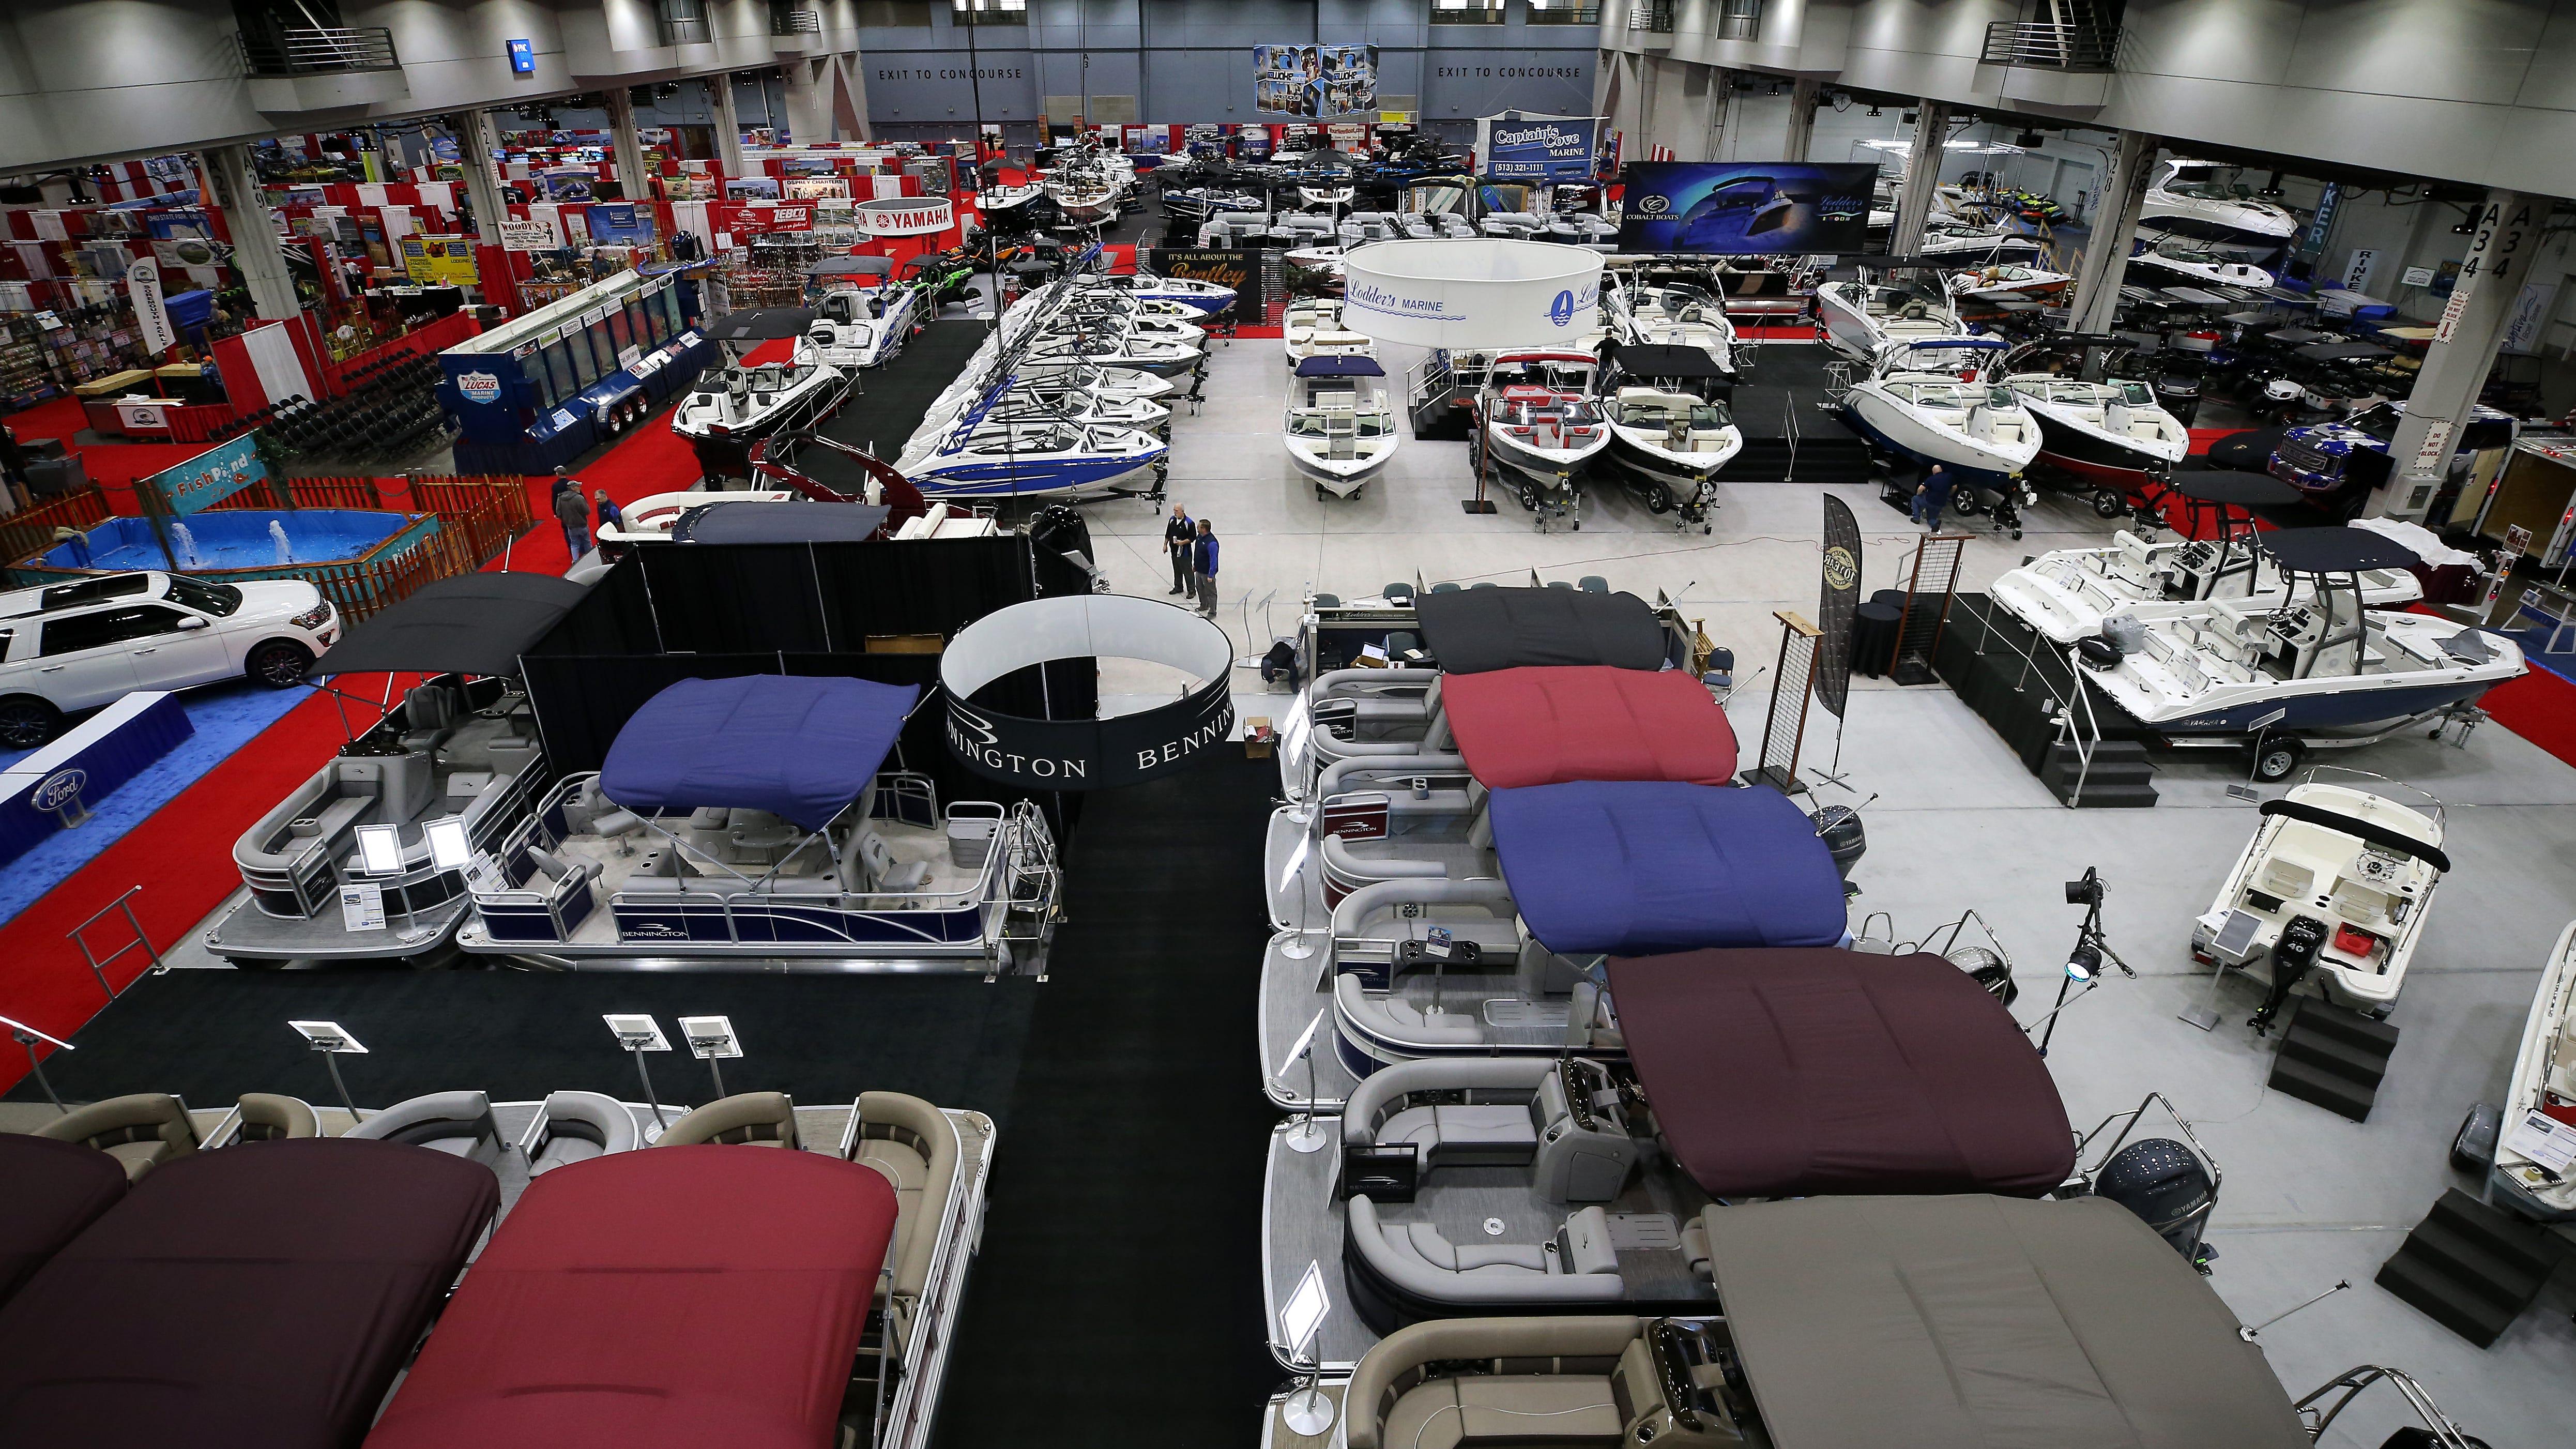 63rd Annual Cincinnati Travel, Sports & Boat Show